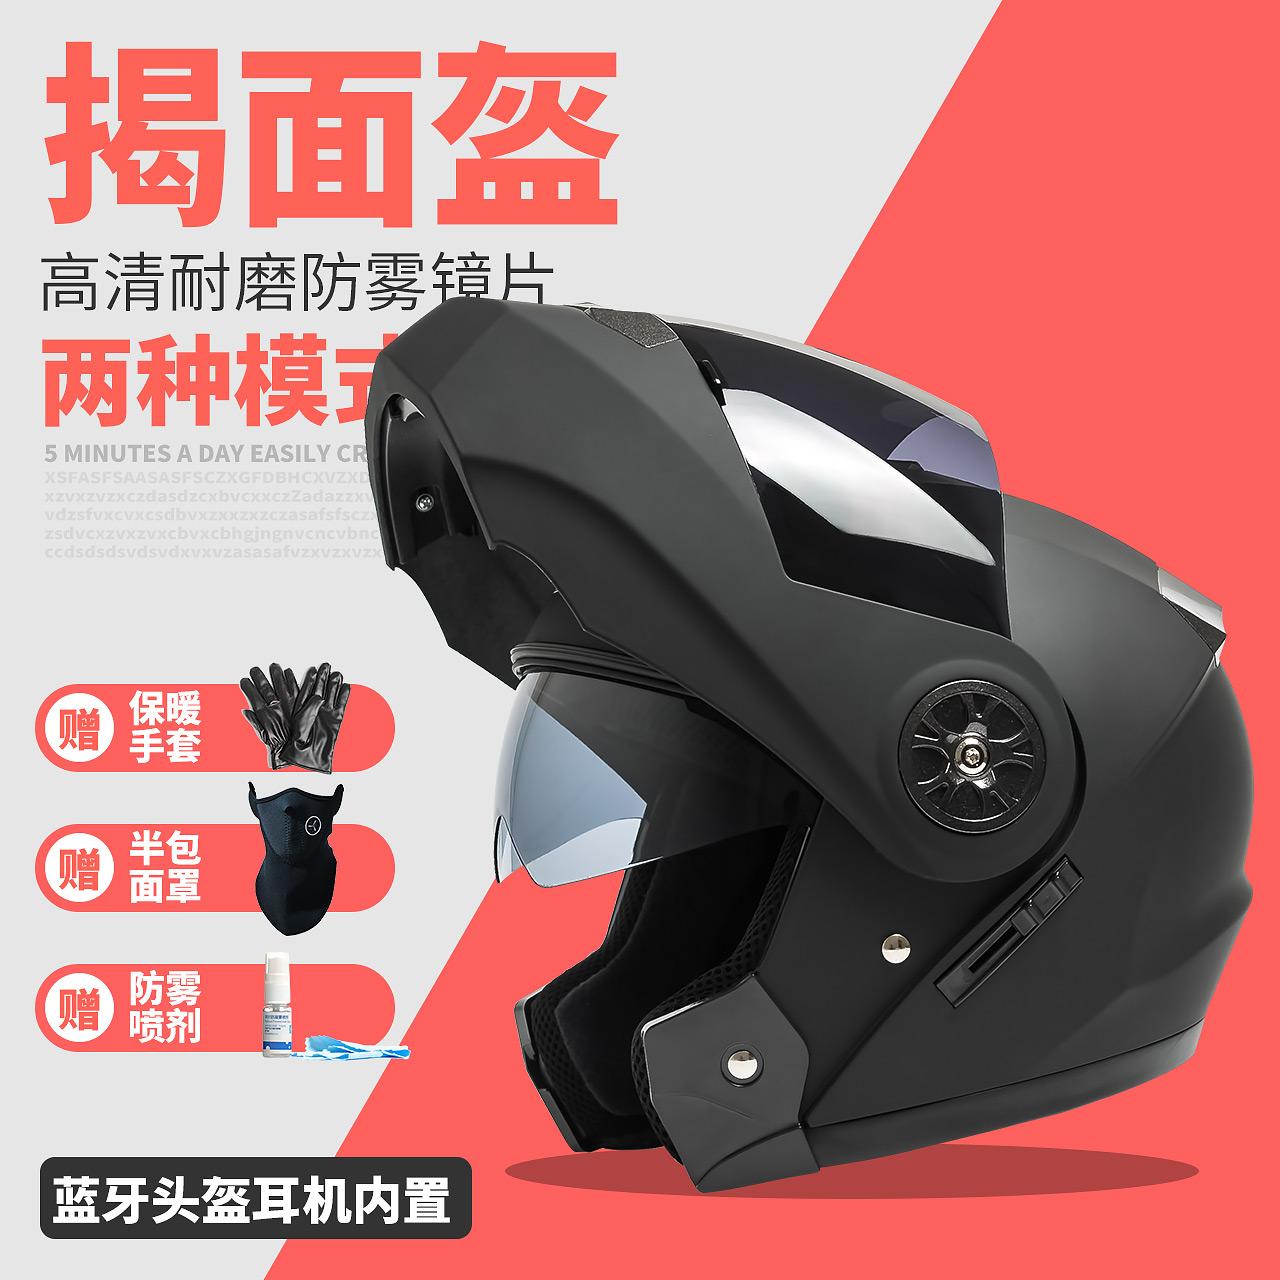 AD揭面盔电动摩托车蓝牙头盔男女四季通用冬季保暖防雾全盔安全帽